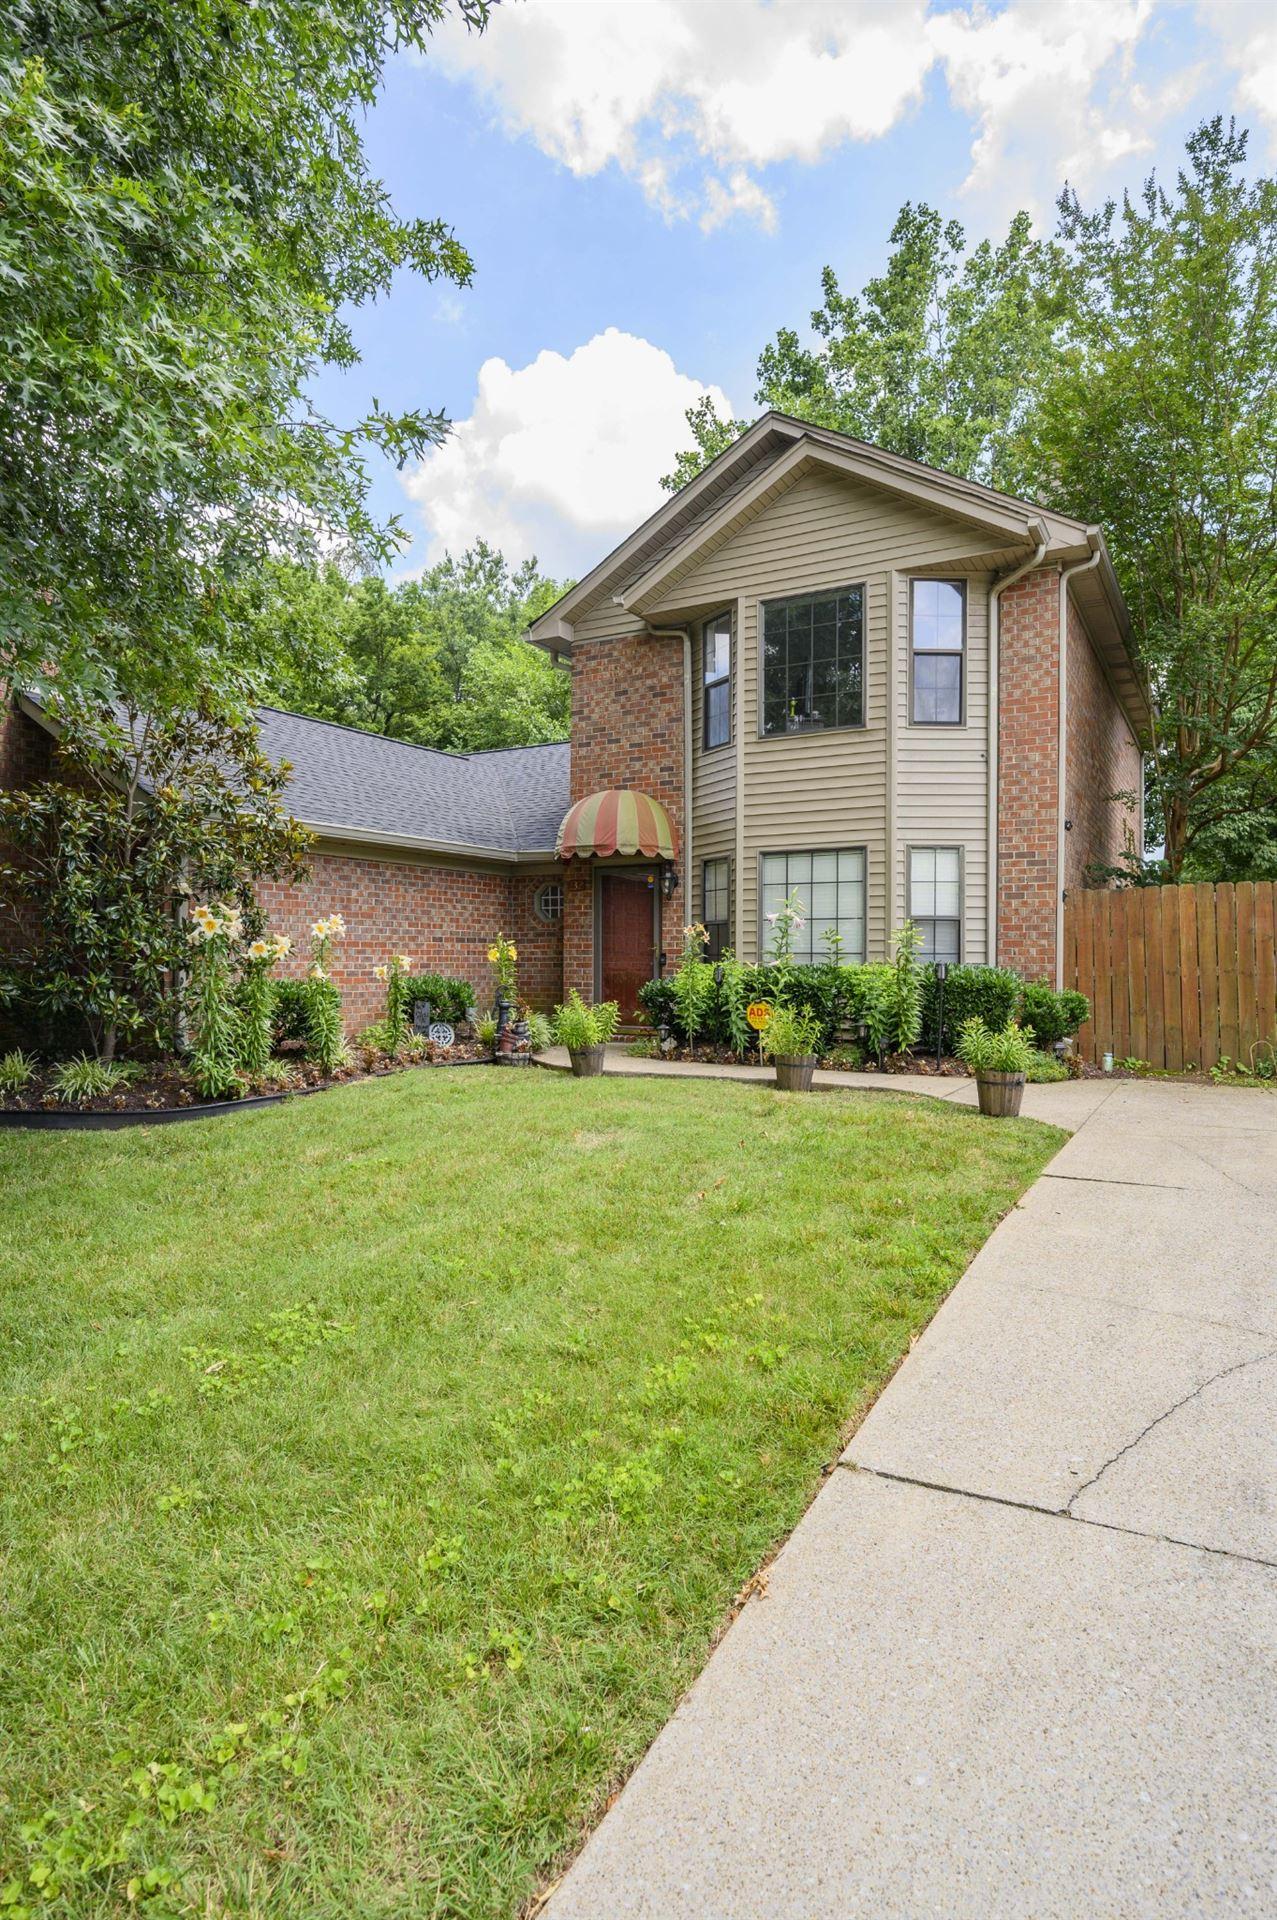 232 Hillside Ct, Murfreesboro, TN 37130 - MLS#: 2274081